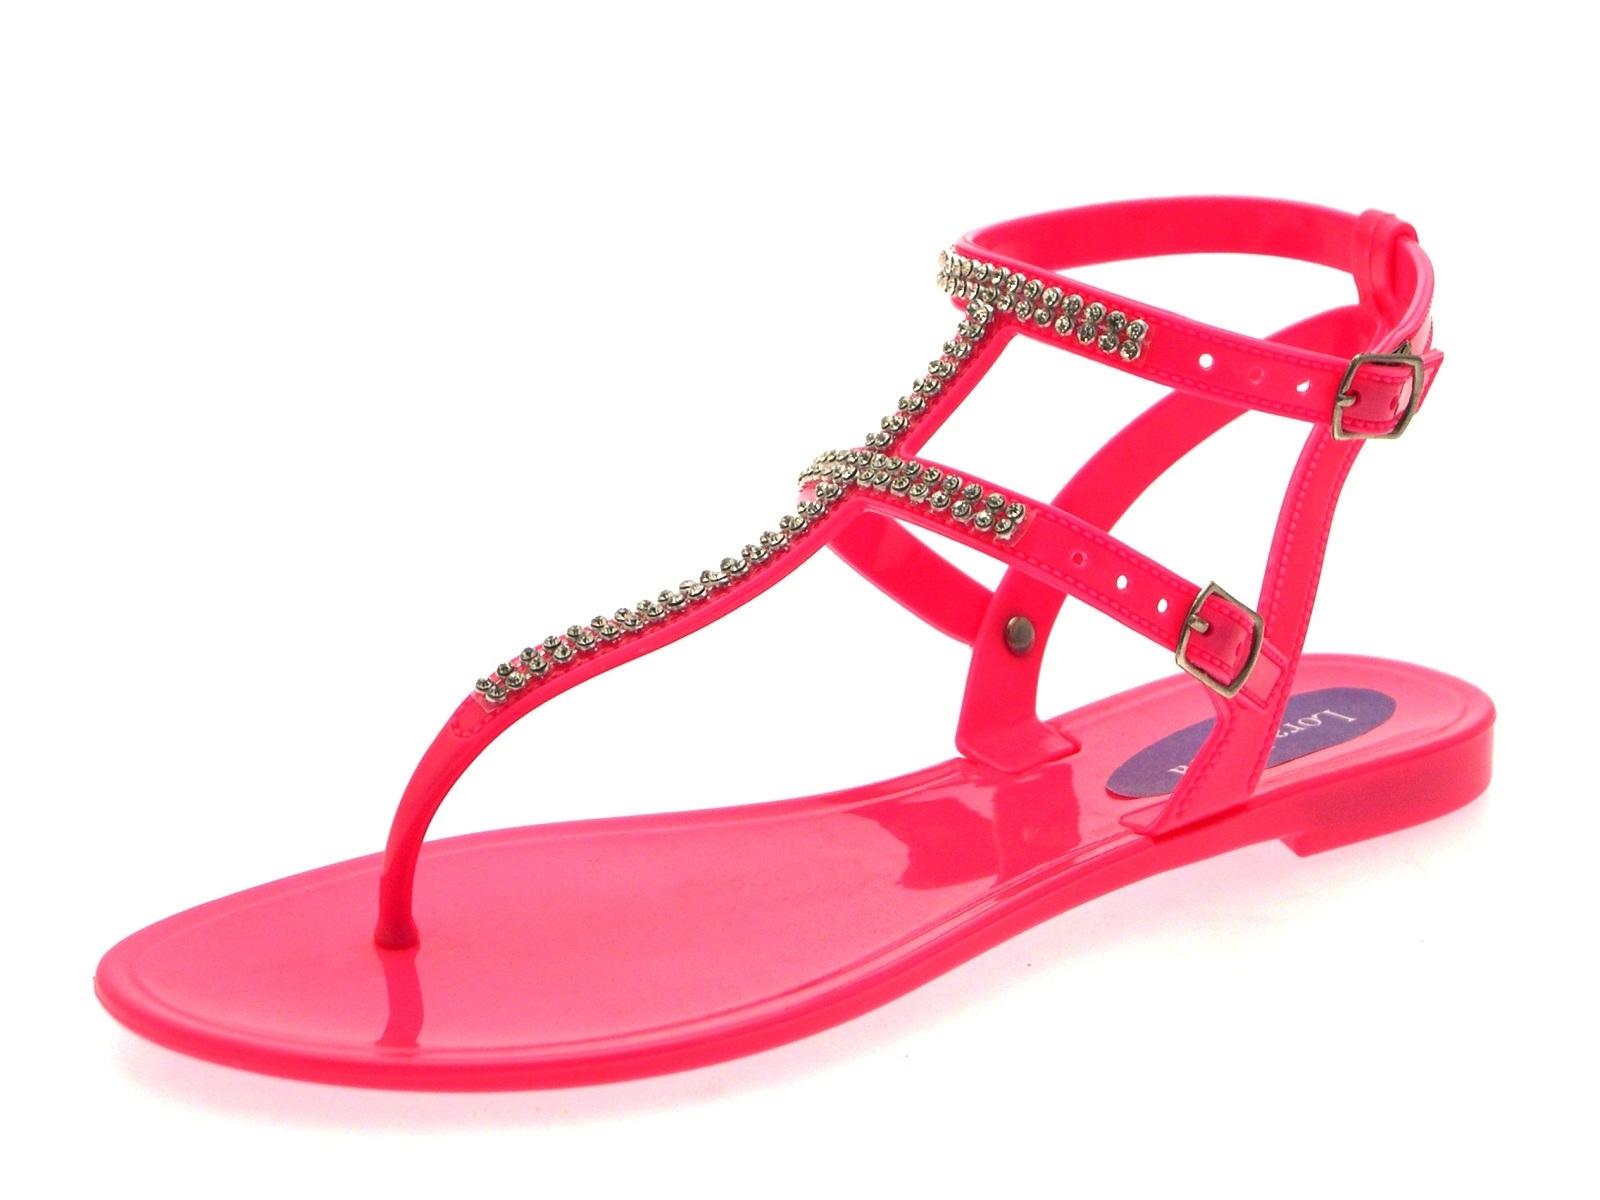 Fuchsia Flat Shoes Uk